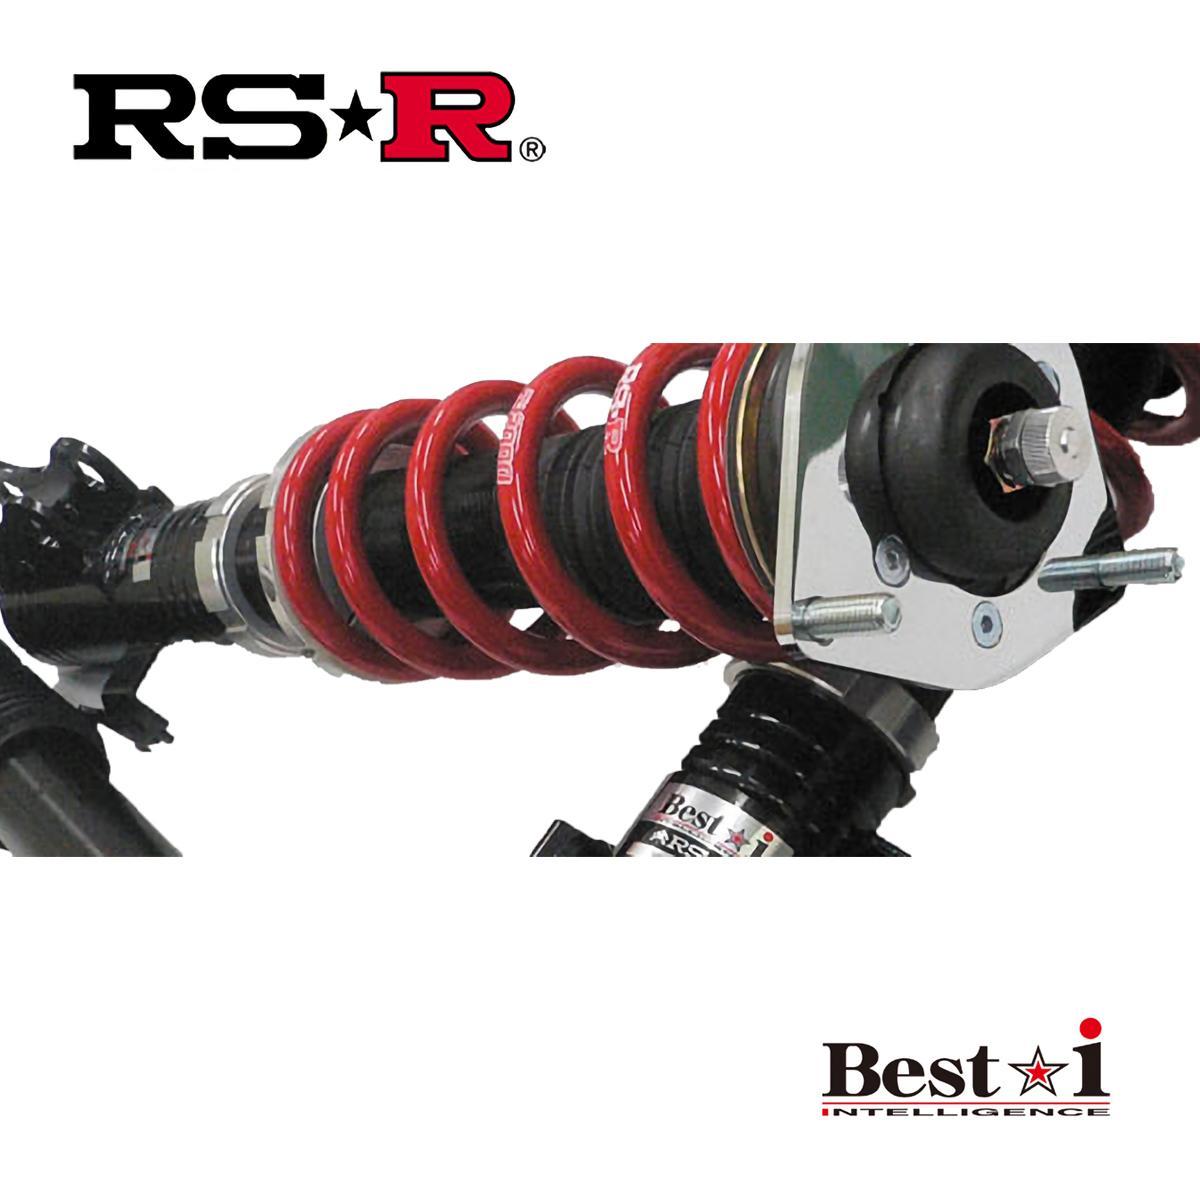 RS-R クラウンハイブリッド AZSH20 RSアドバンス 車高調 リア車高調整:ネジ式/ハードバネレート仕様 BIT967H ベストi RSR 個人宅発送追金有